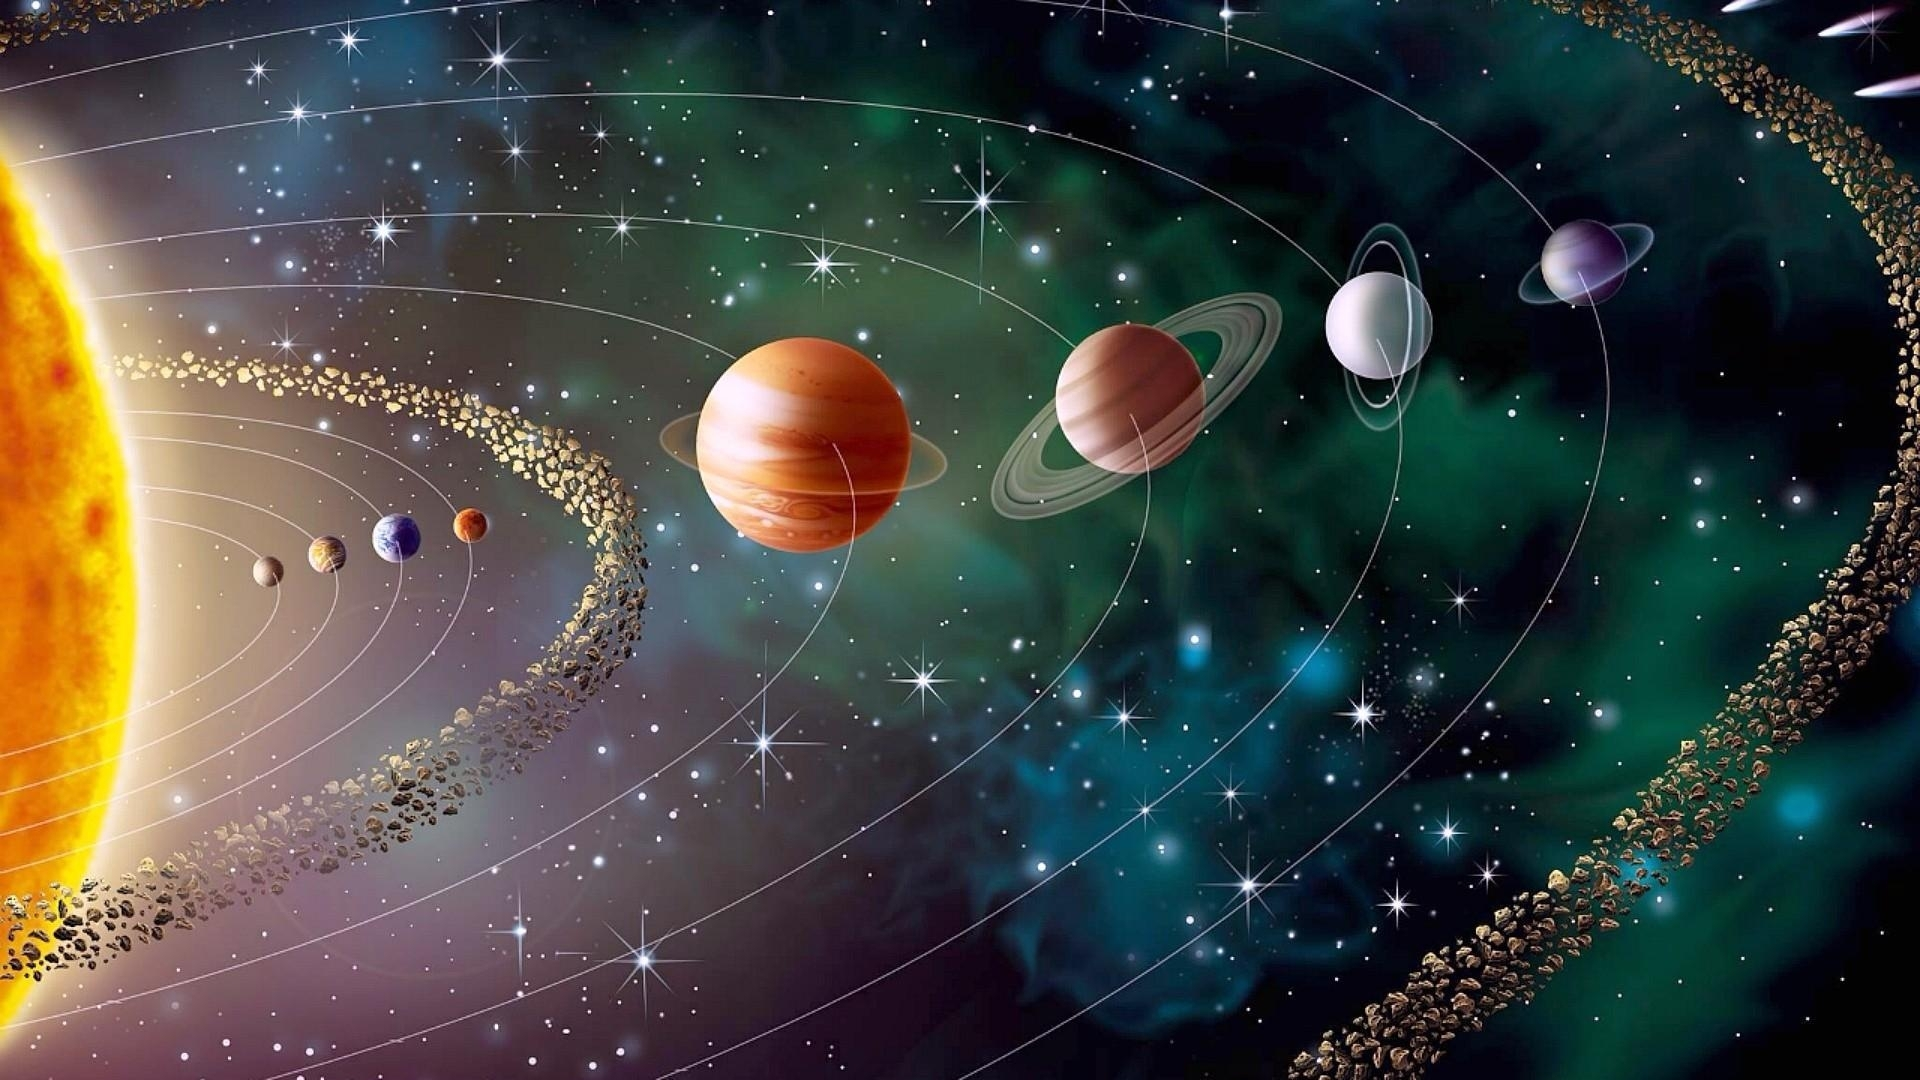 solar system wallpaper | wallpaper studio 10 | tens of thousands hd